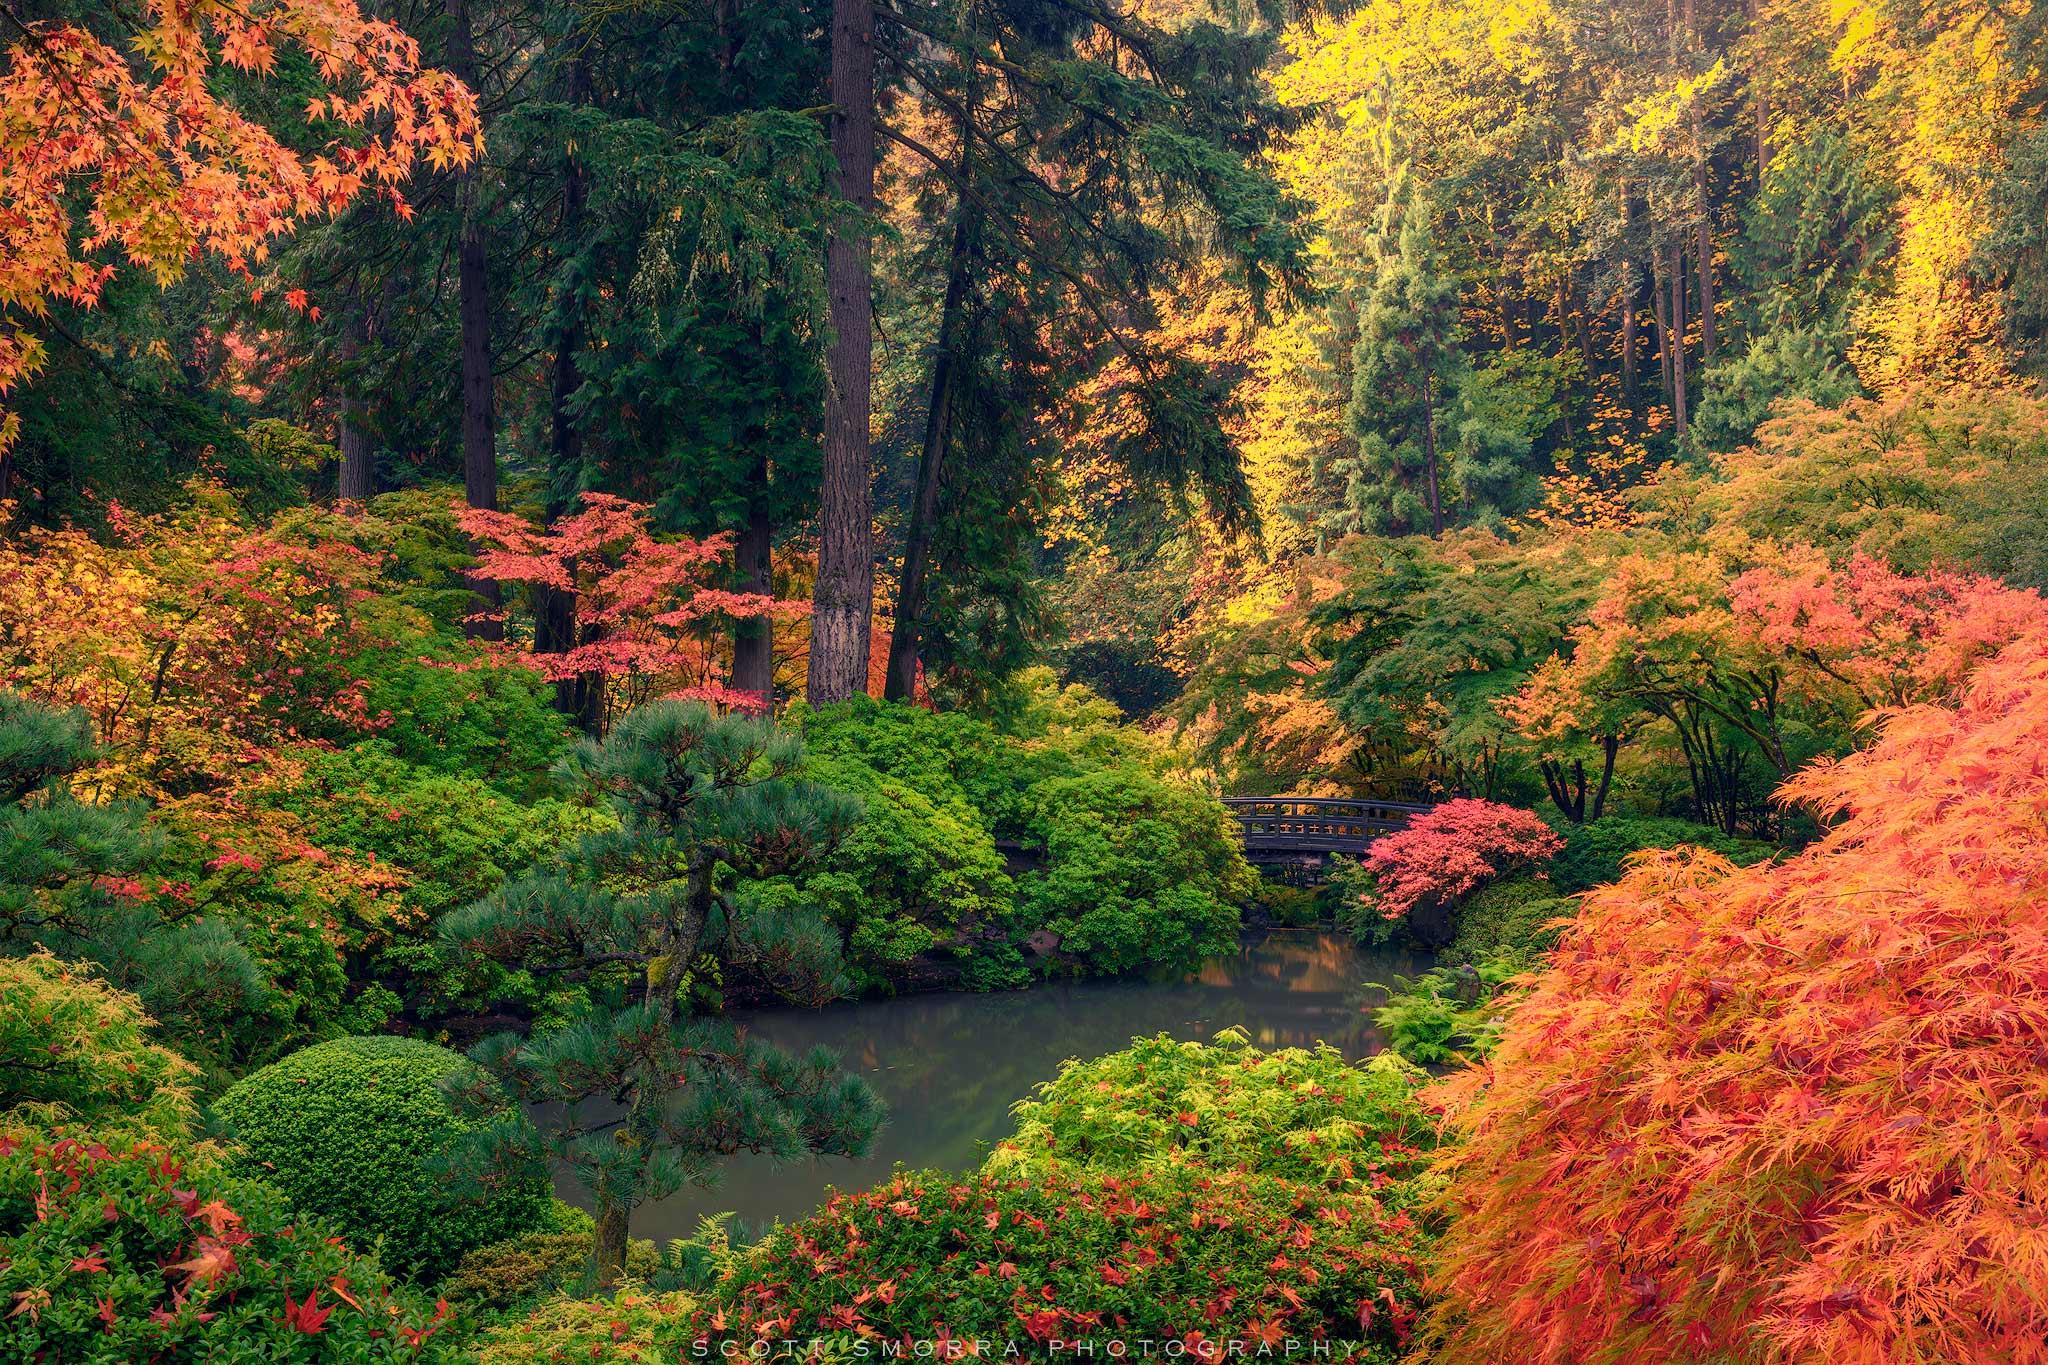 Portland, Japanese, Garden, Fall, Tree, Maple, bridge, autumn, photo